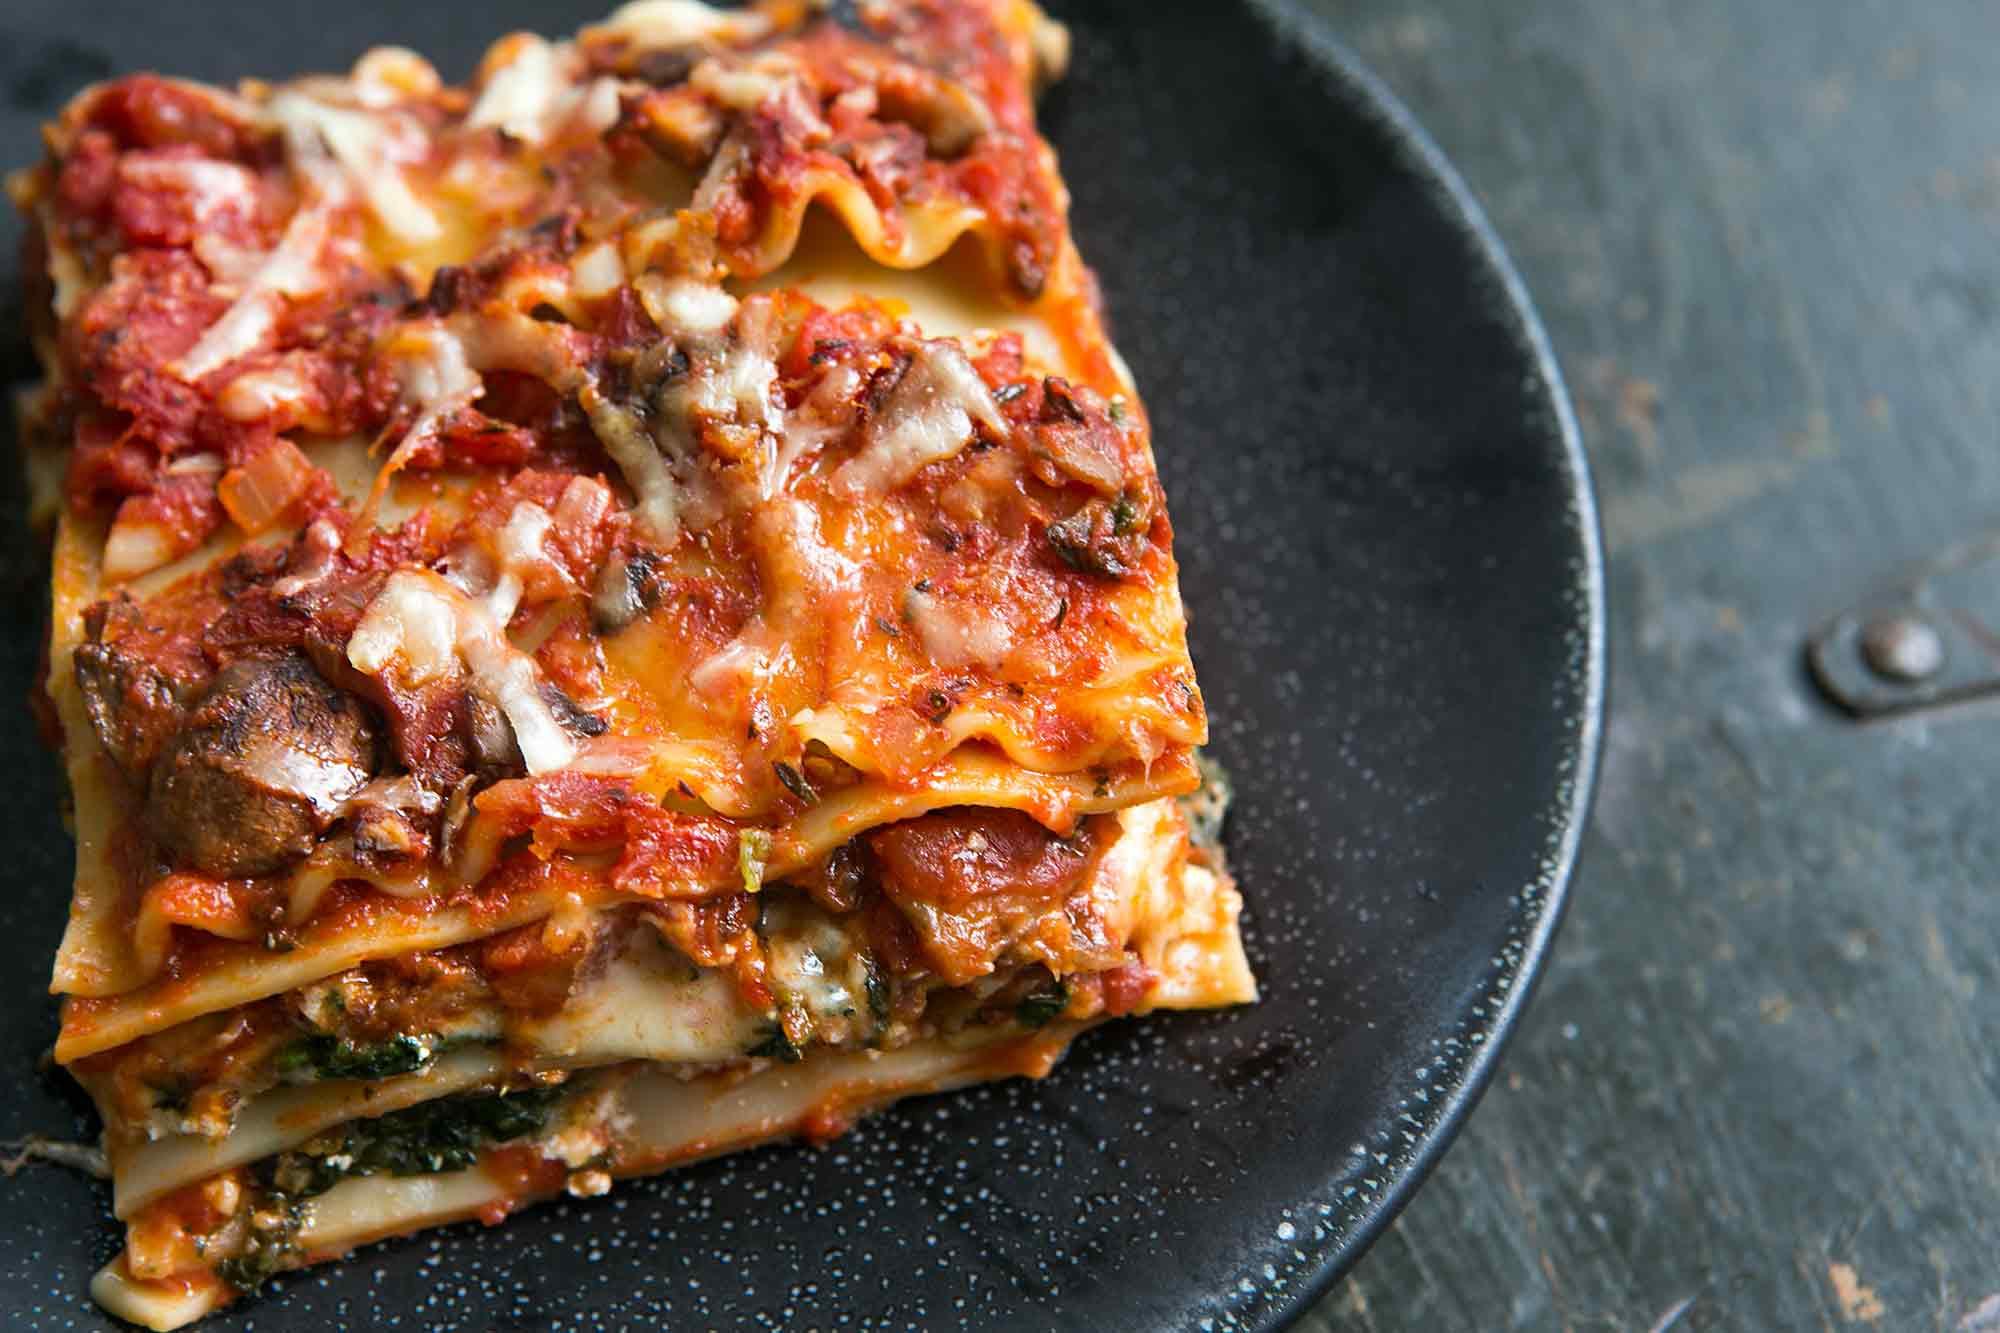 Vegetarian Lasagna Recipes  Ve able Lasagna A Favorite for All